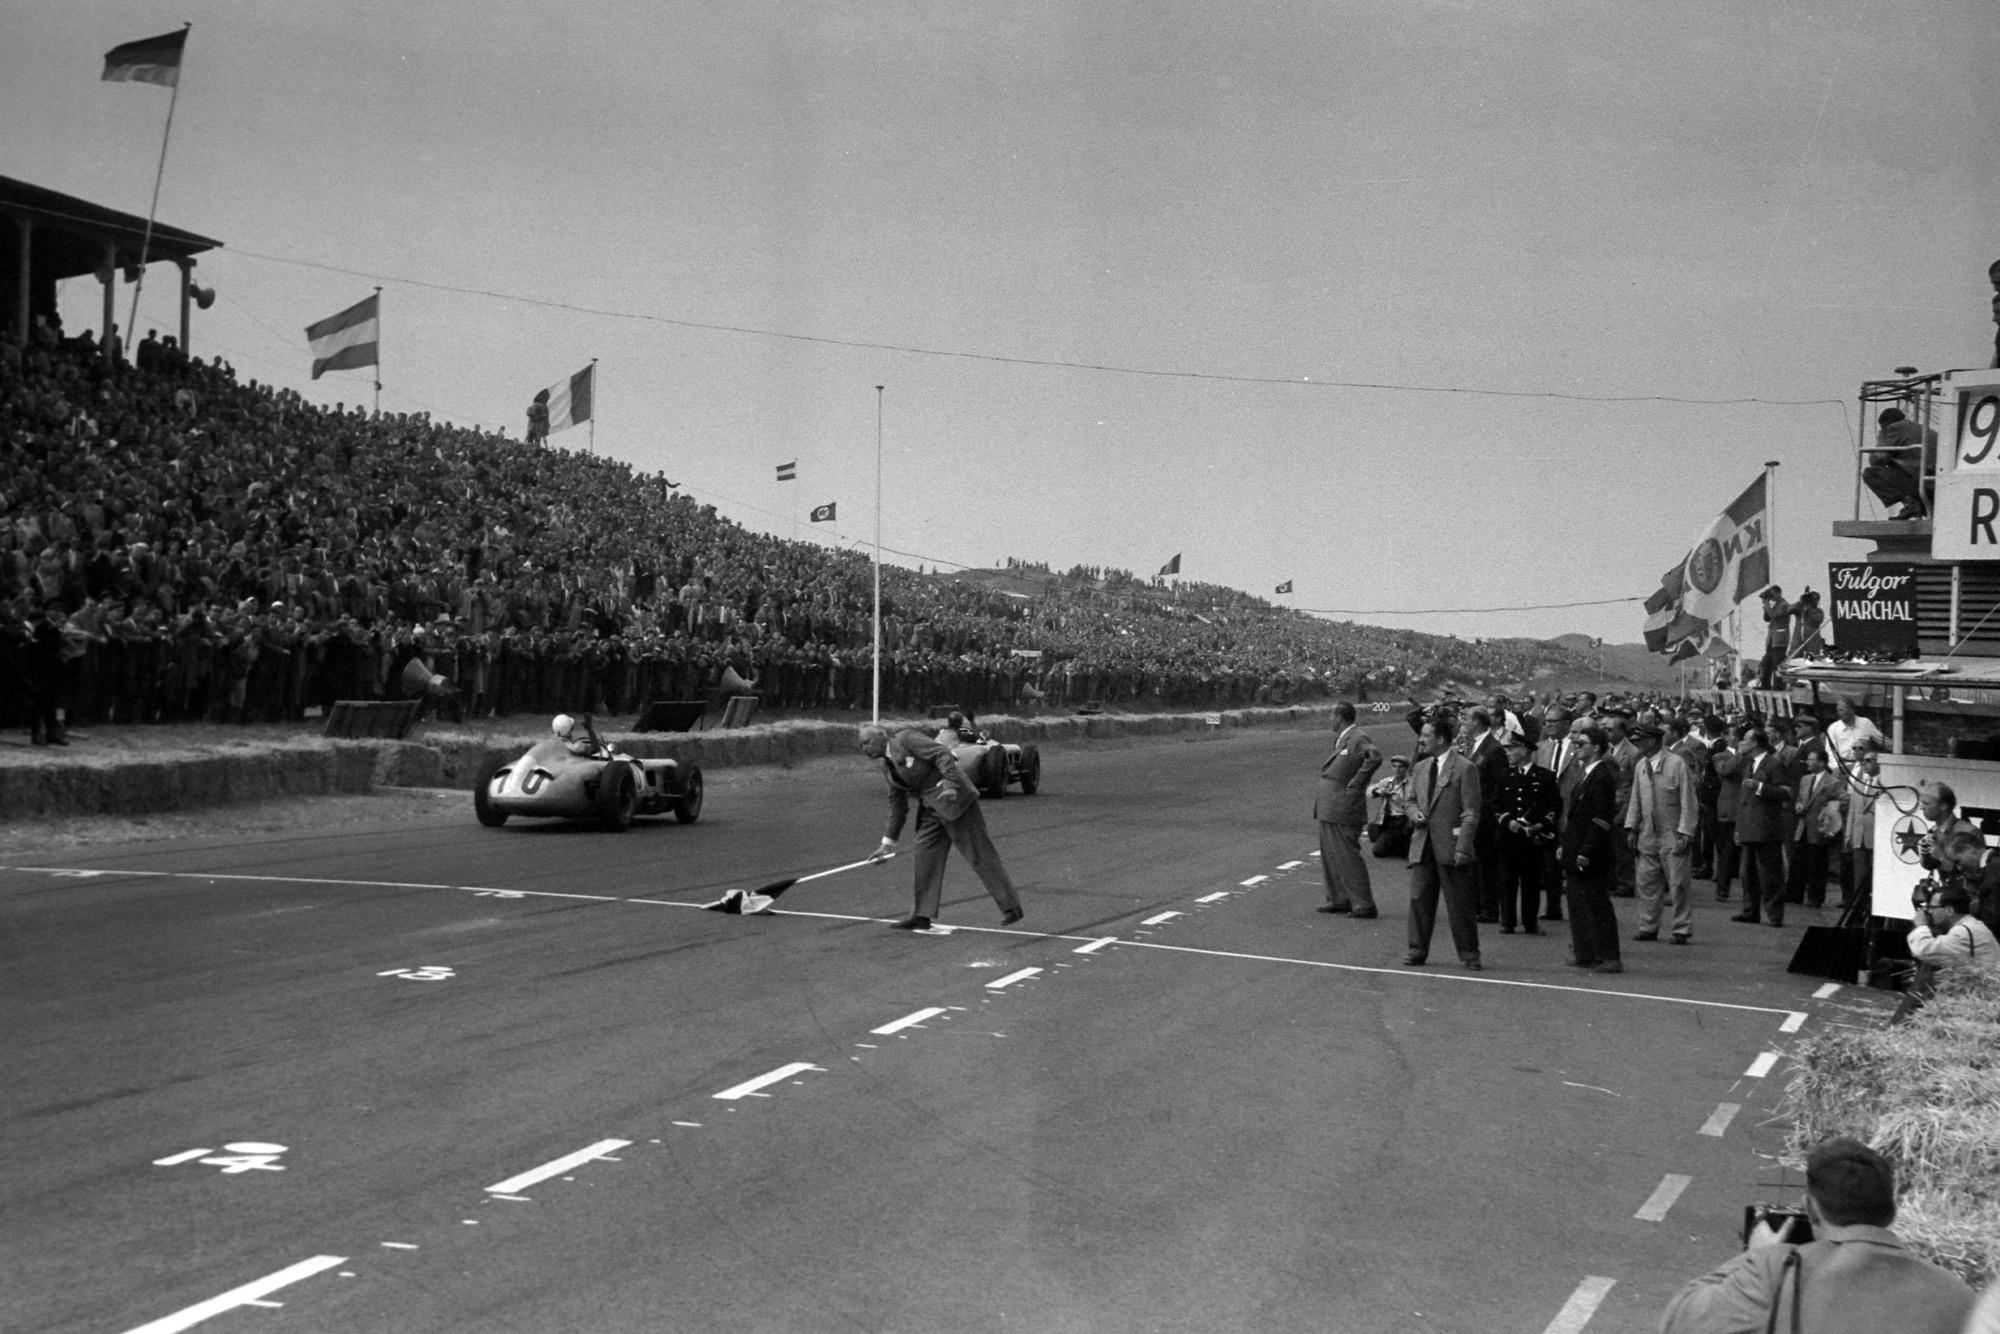 Fangio takes the win